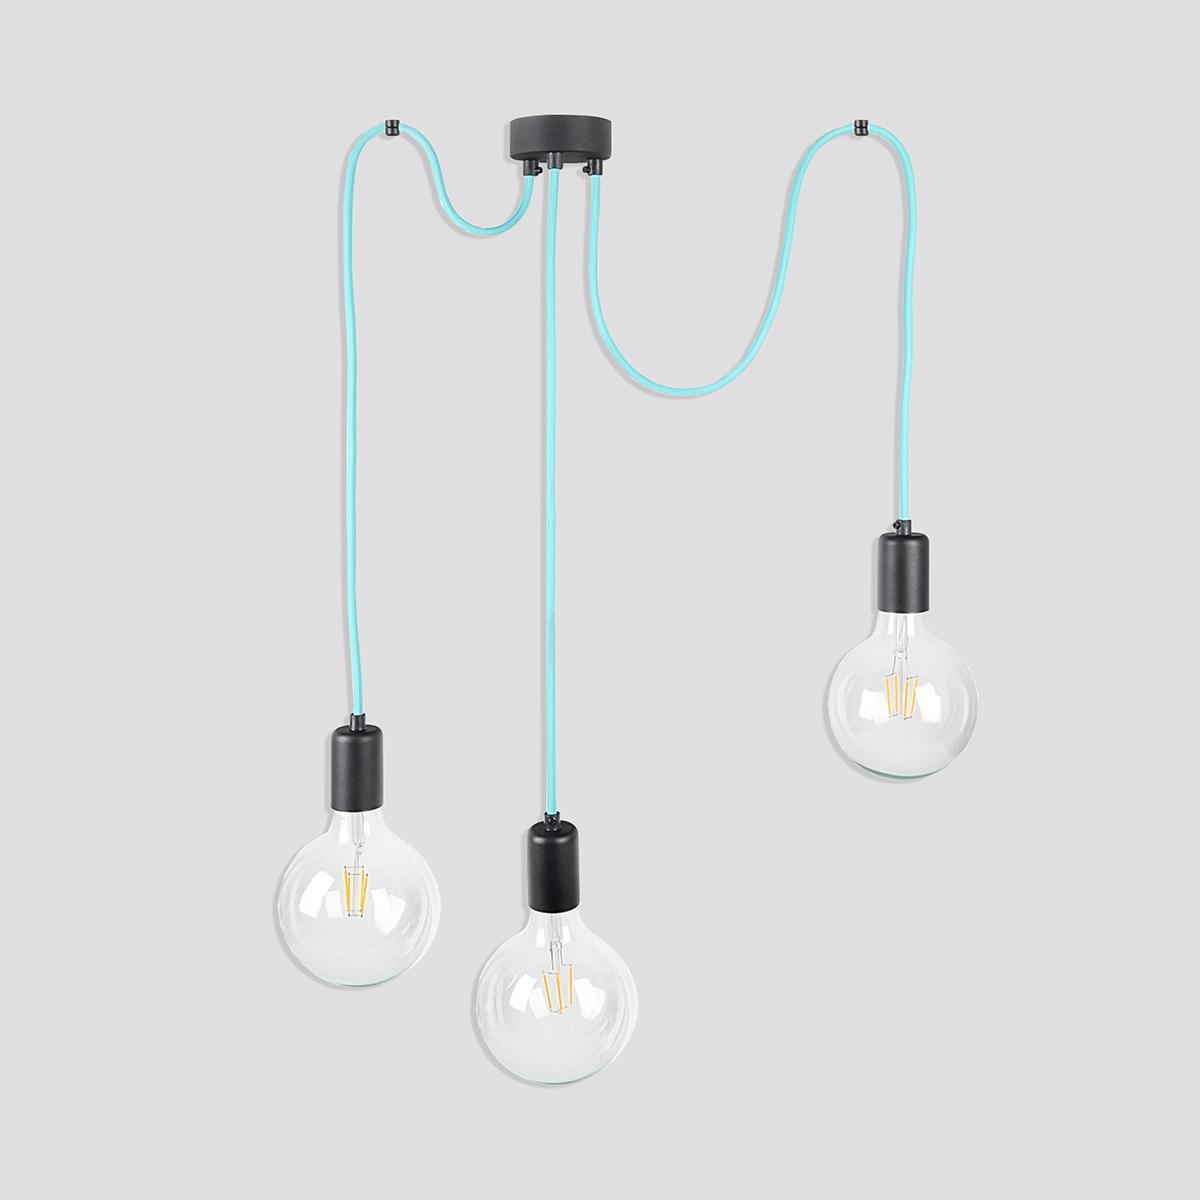 Zdjęcie produktu LAMPA PAJĄK CABLE THREE